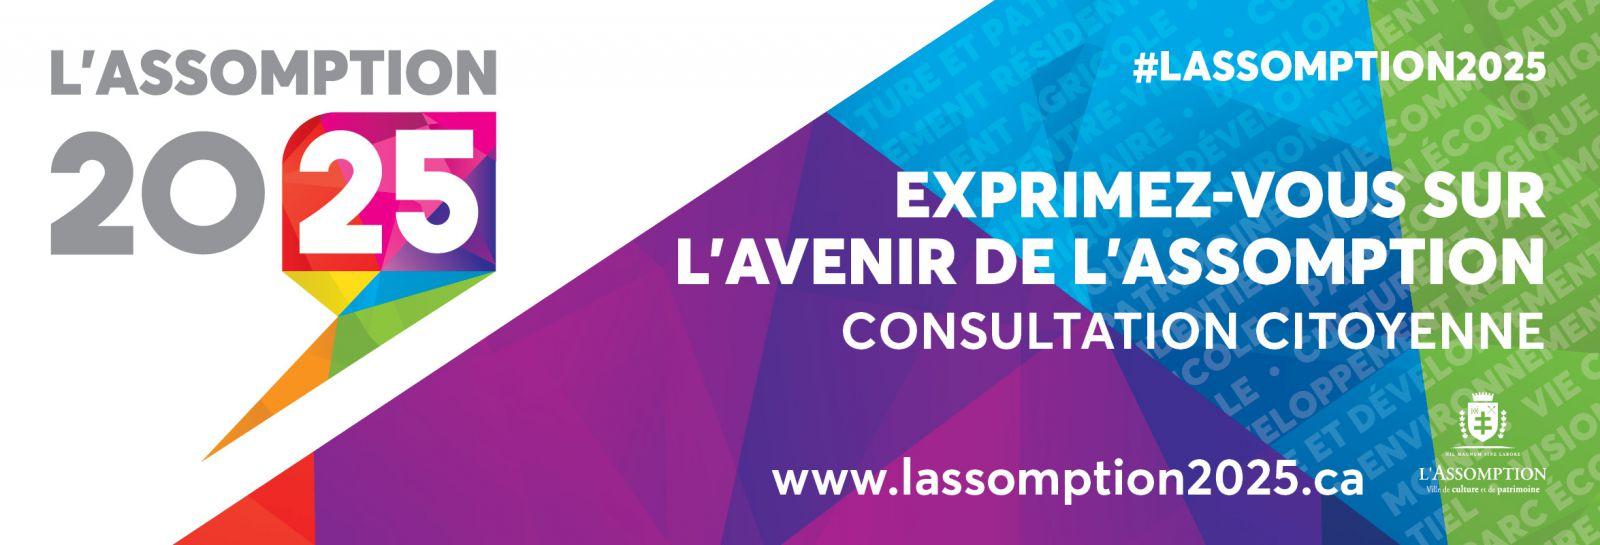 lassomption 2025